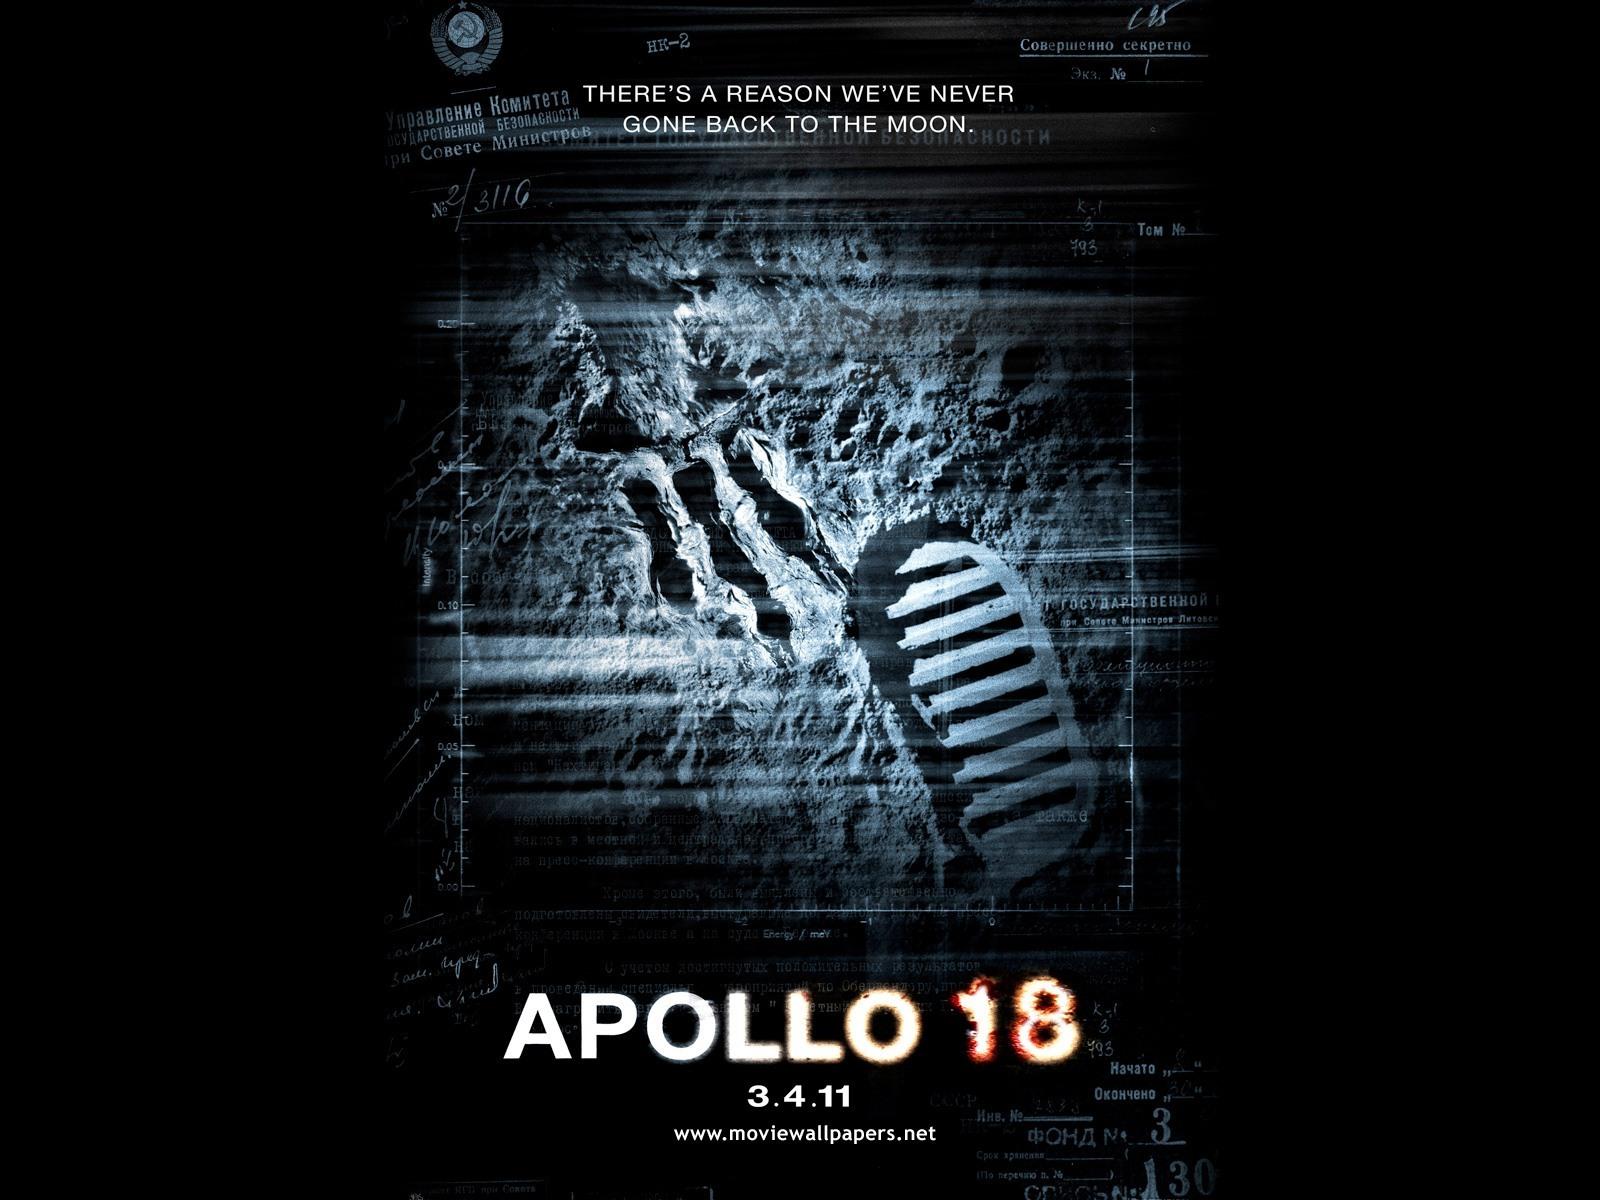 http://2.bp.blogspot.com/-3zdE1rgimsI/TkfJNIfcIkI/AAAAAAAAAds/h-uoXilUcnk/s1600/Apollo%2B18.jpg